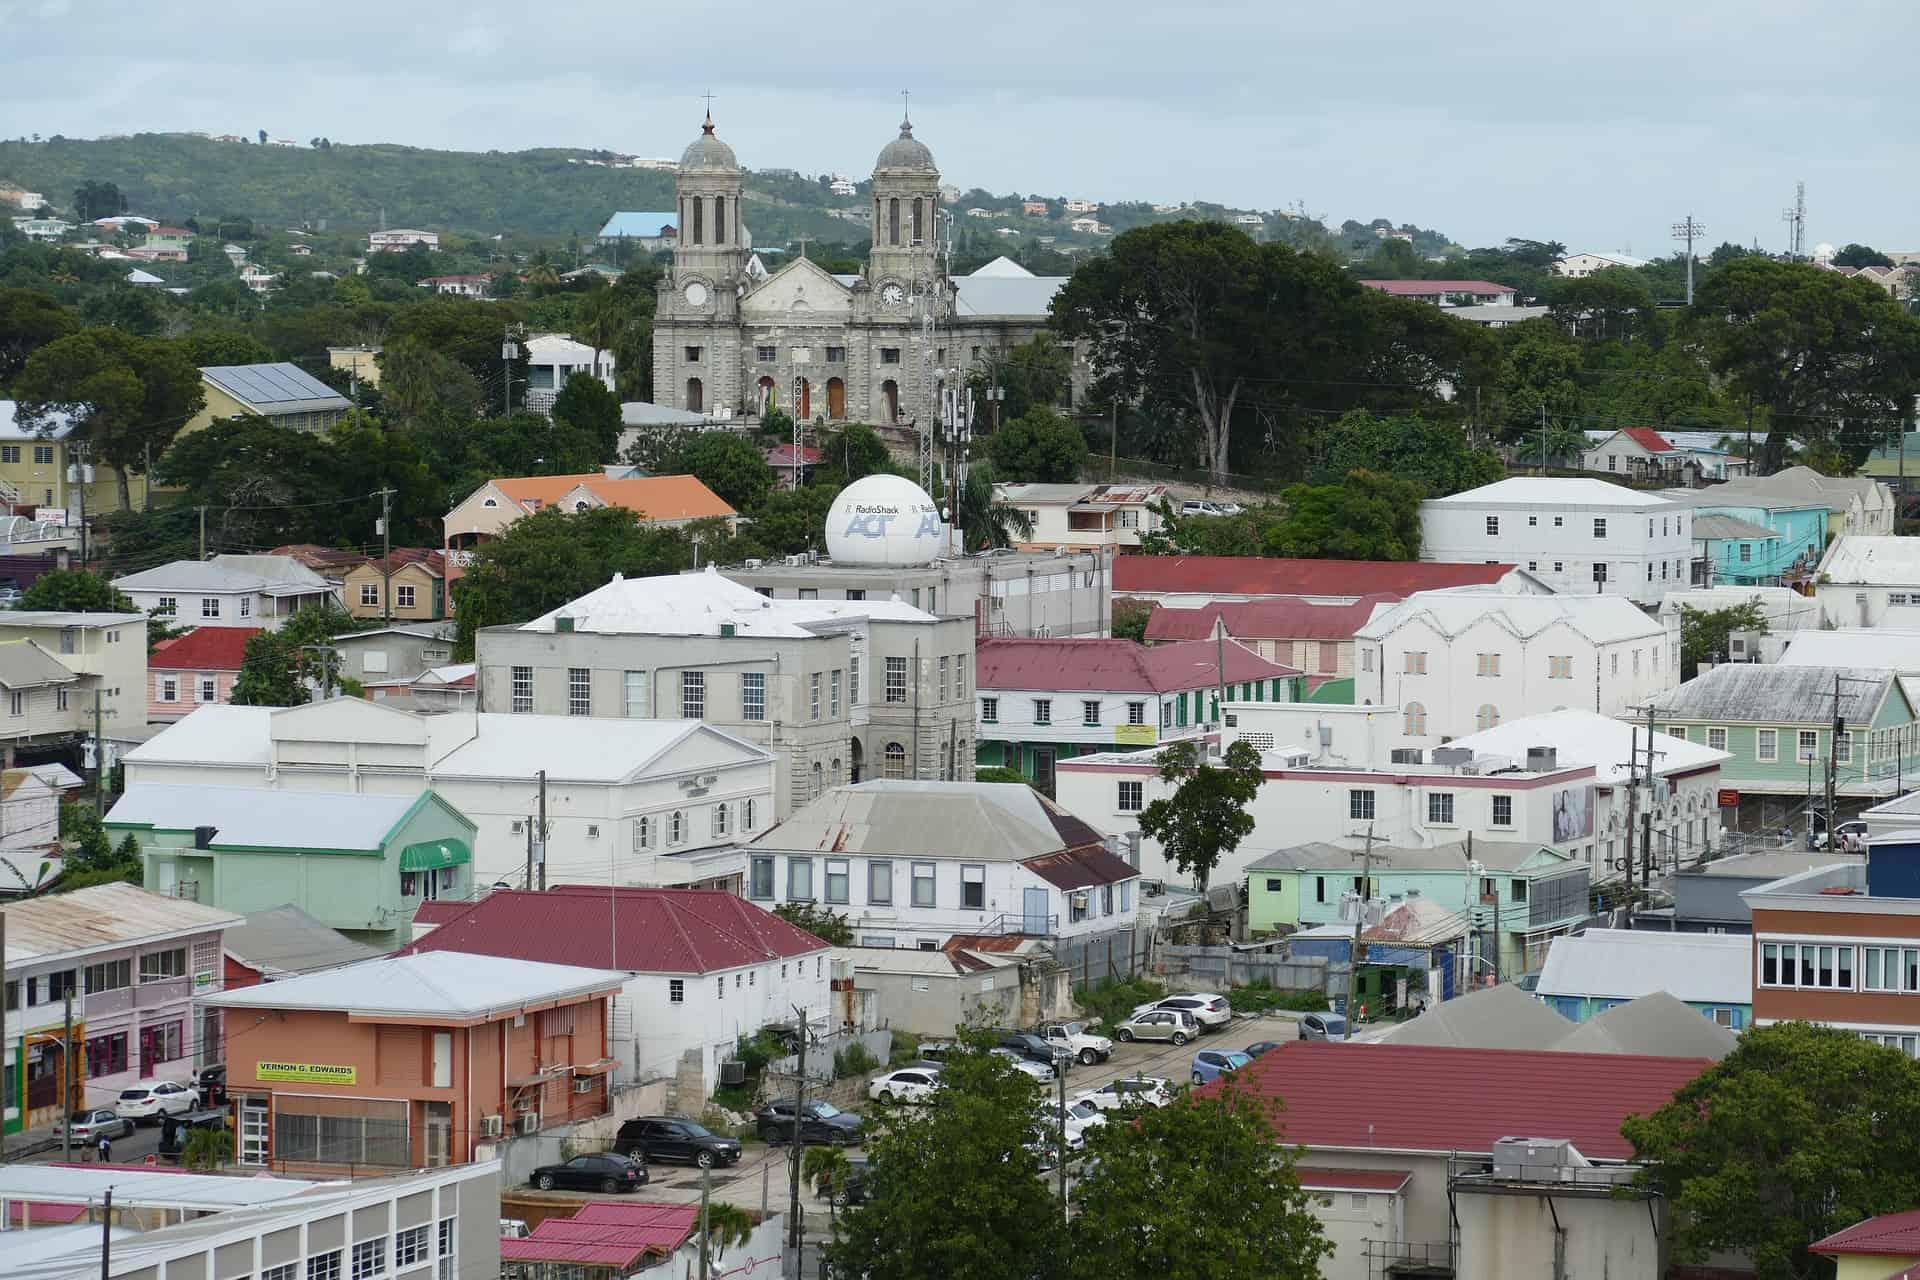 St John's, Antigua Town